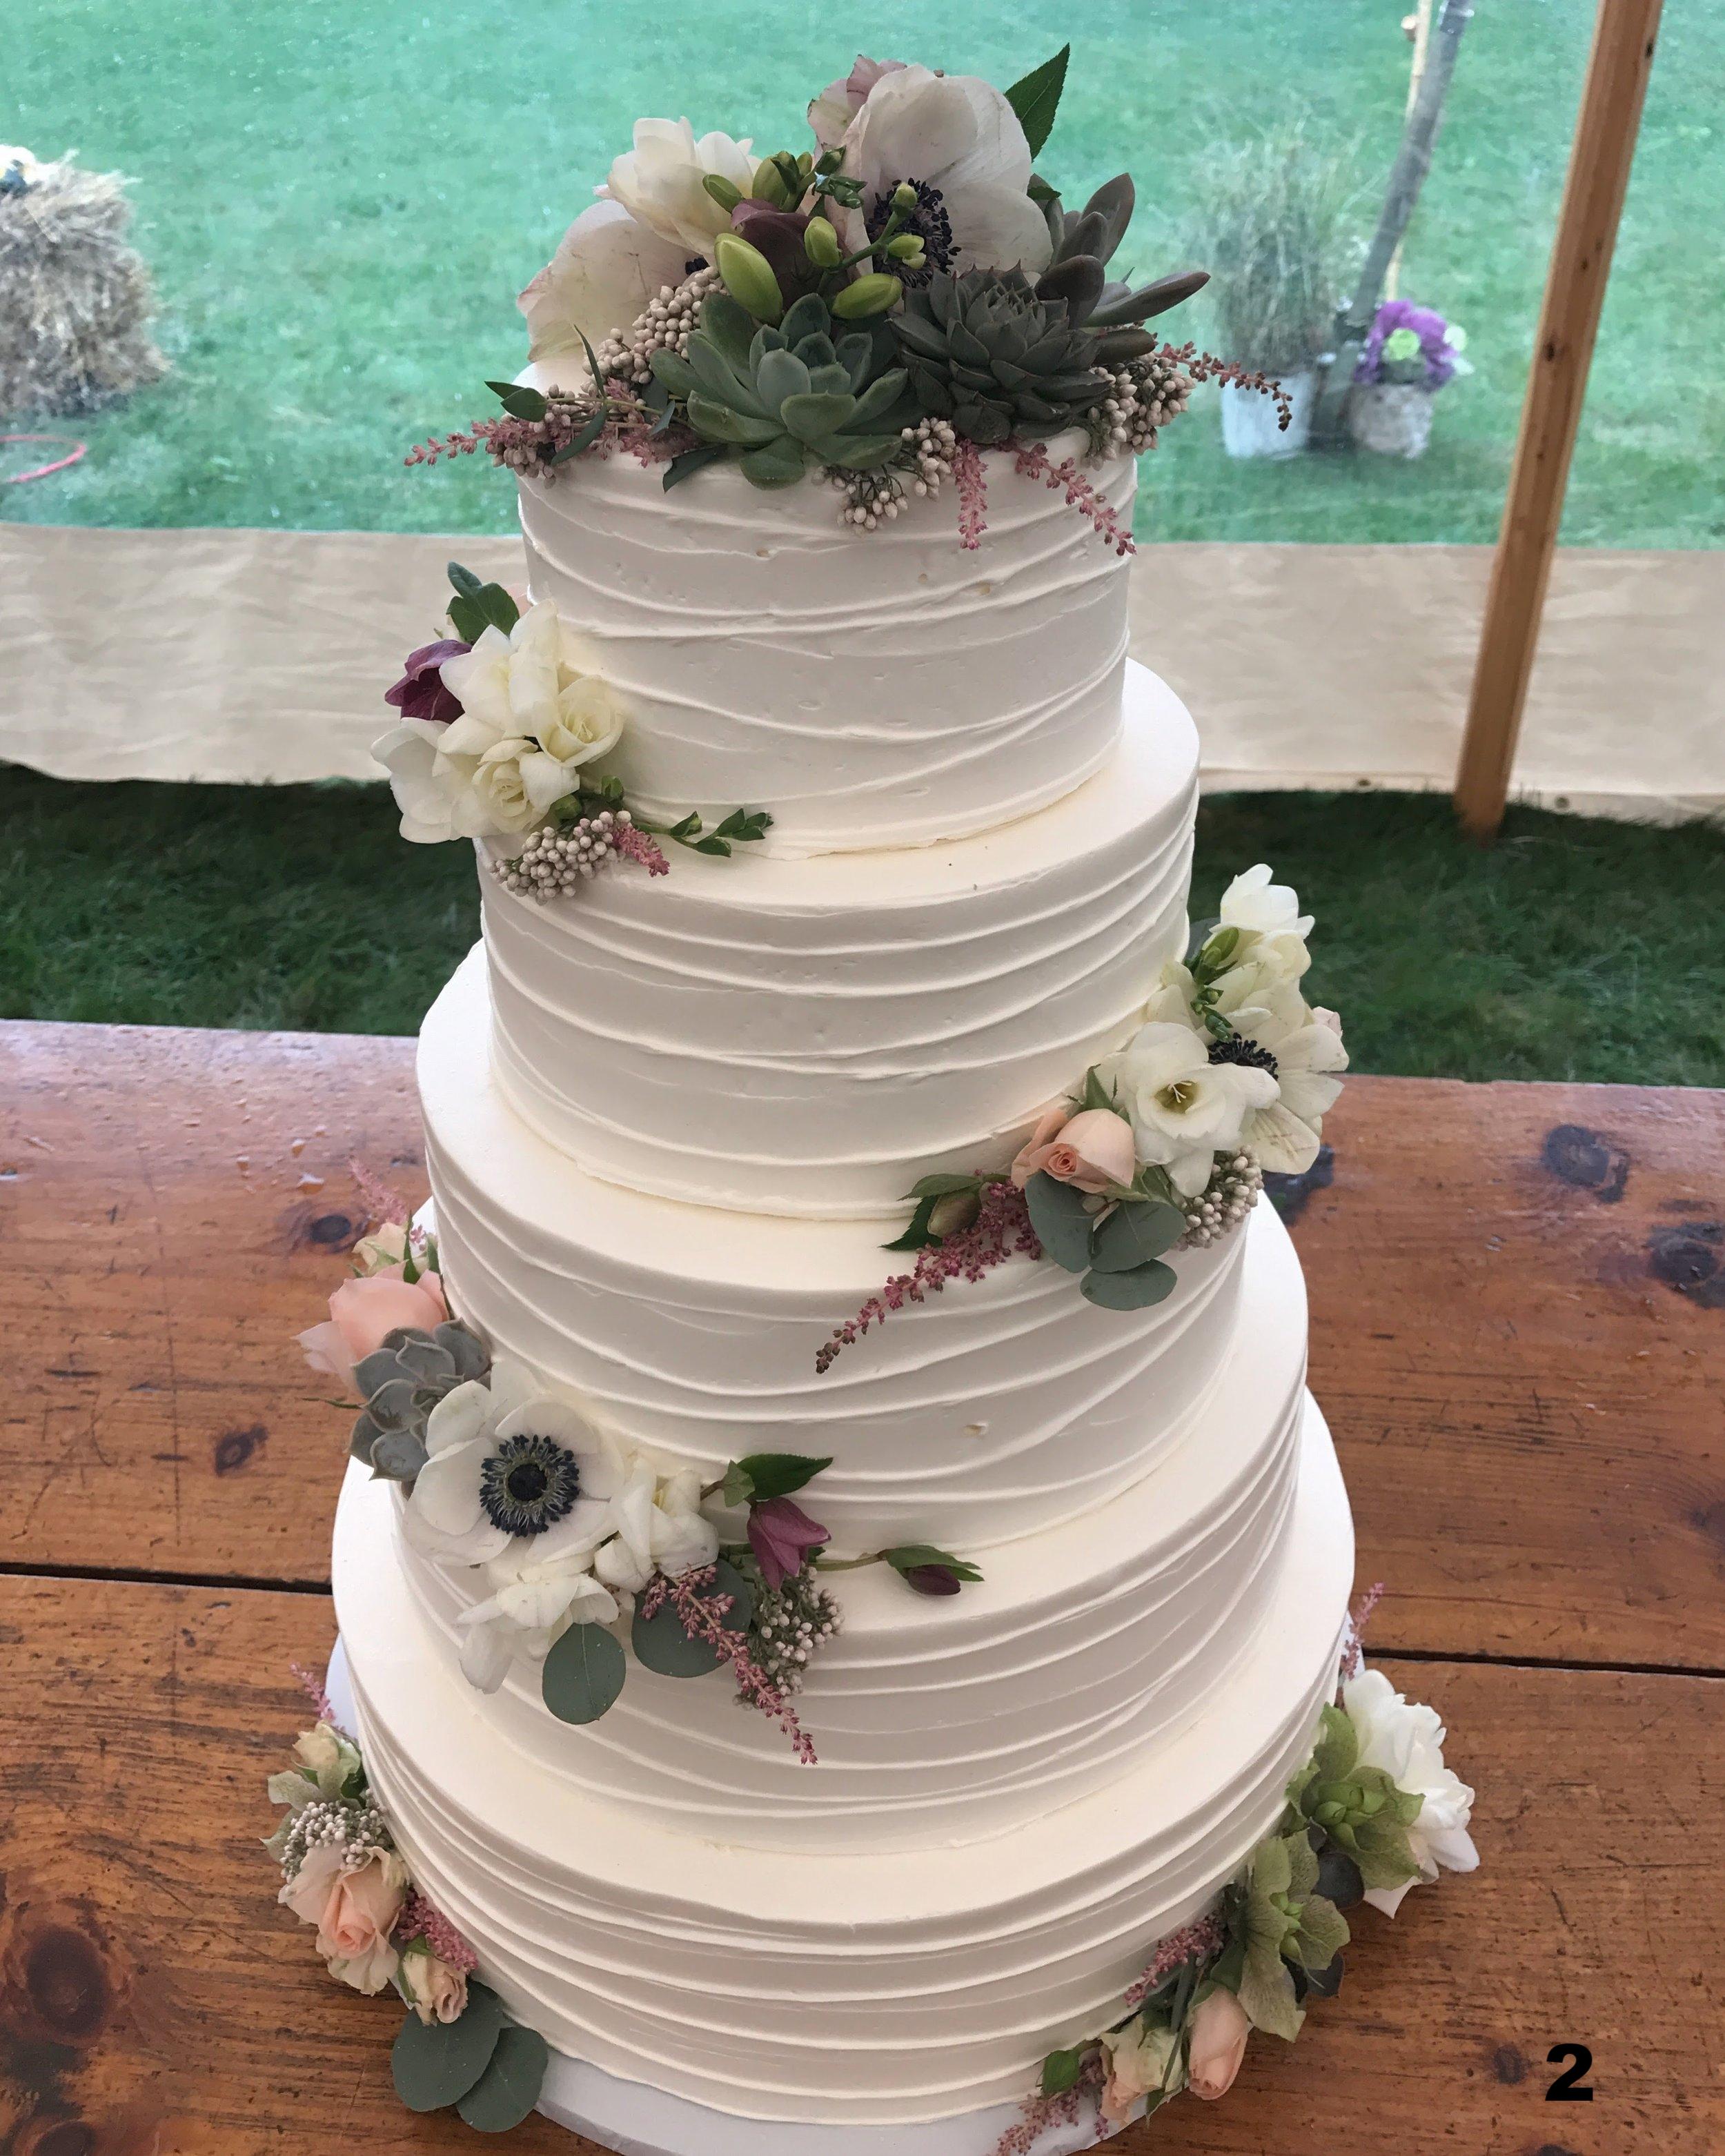 Wedding Cakes Gallery 1 Cottage St Bakery